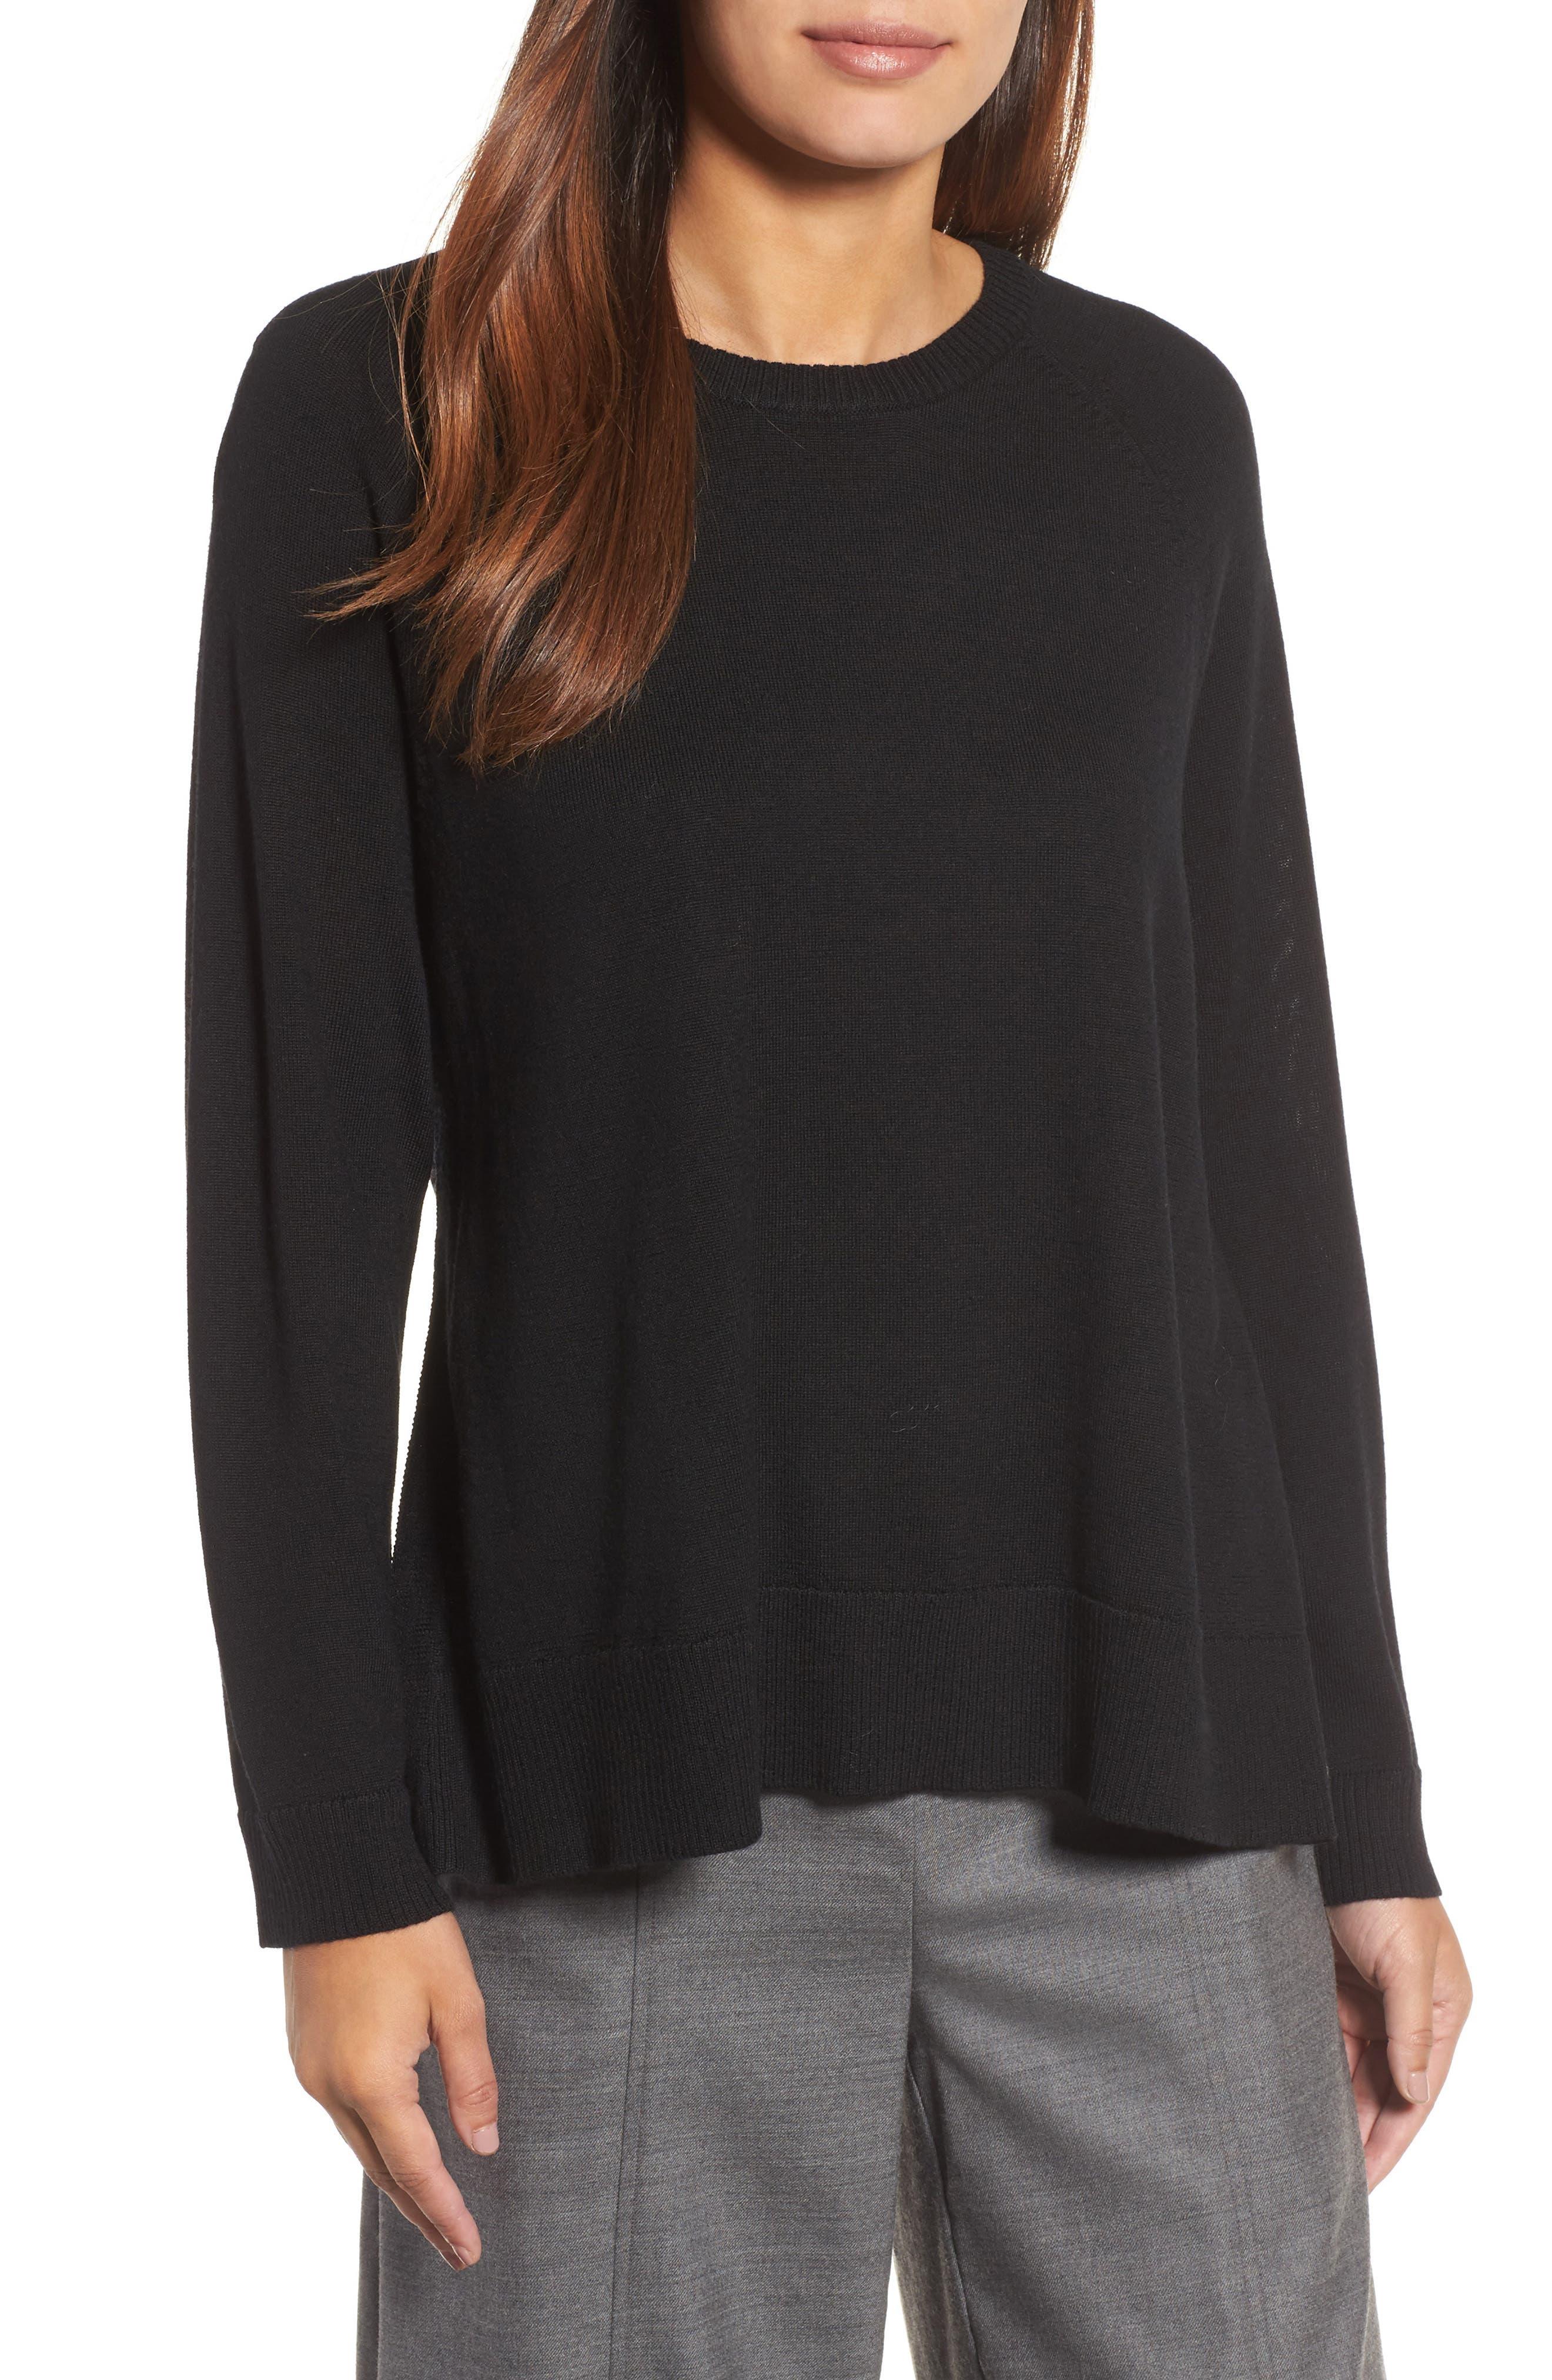 Alternate Image 1 Selected - Eileen Fisher Side Slit Merino Wool Sweater